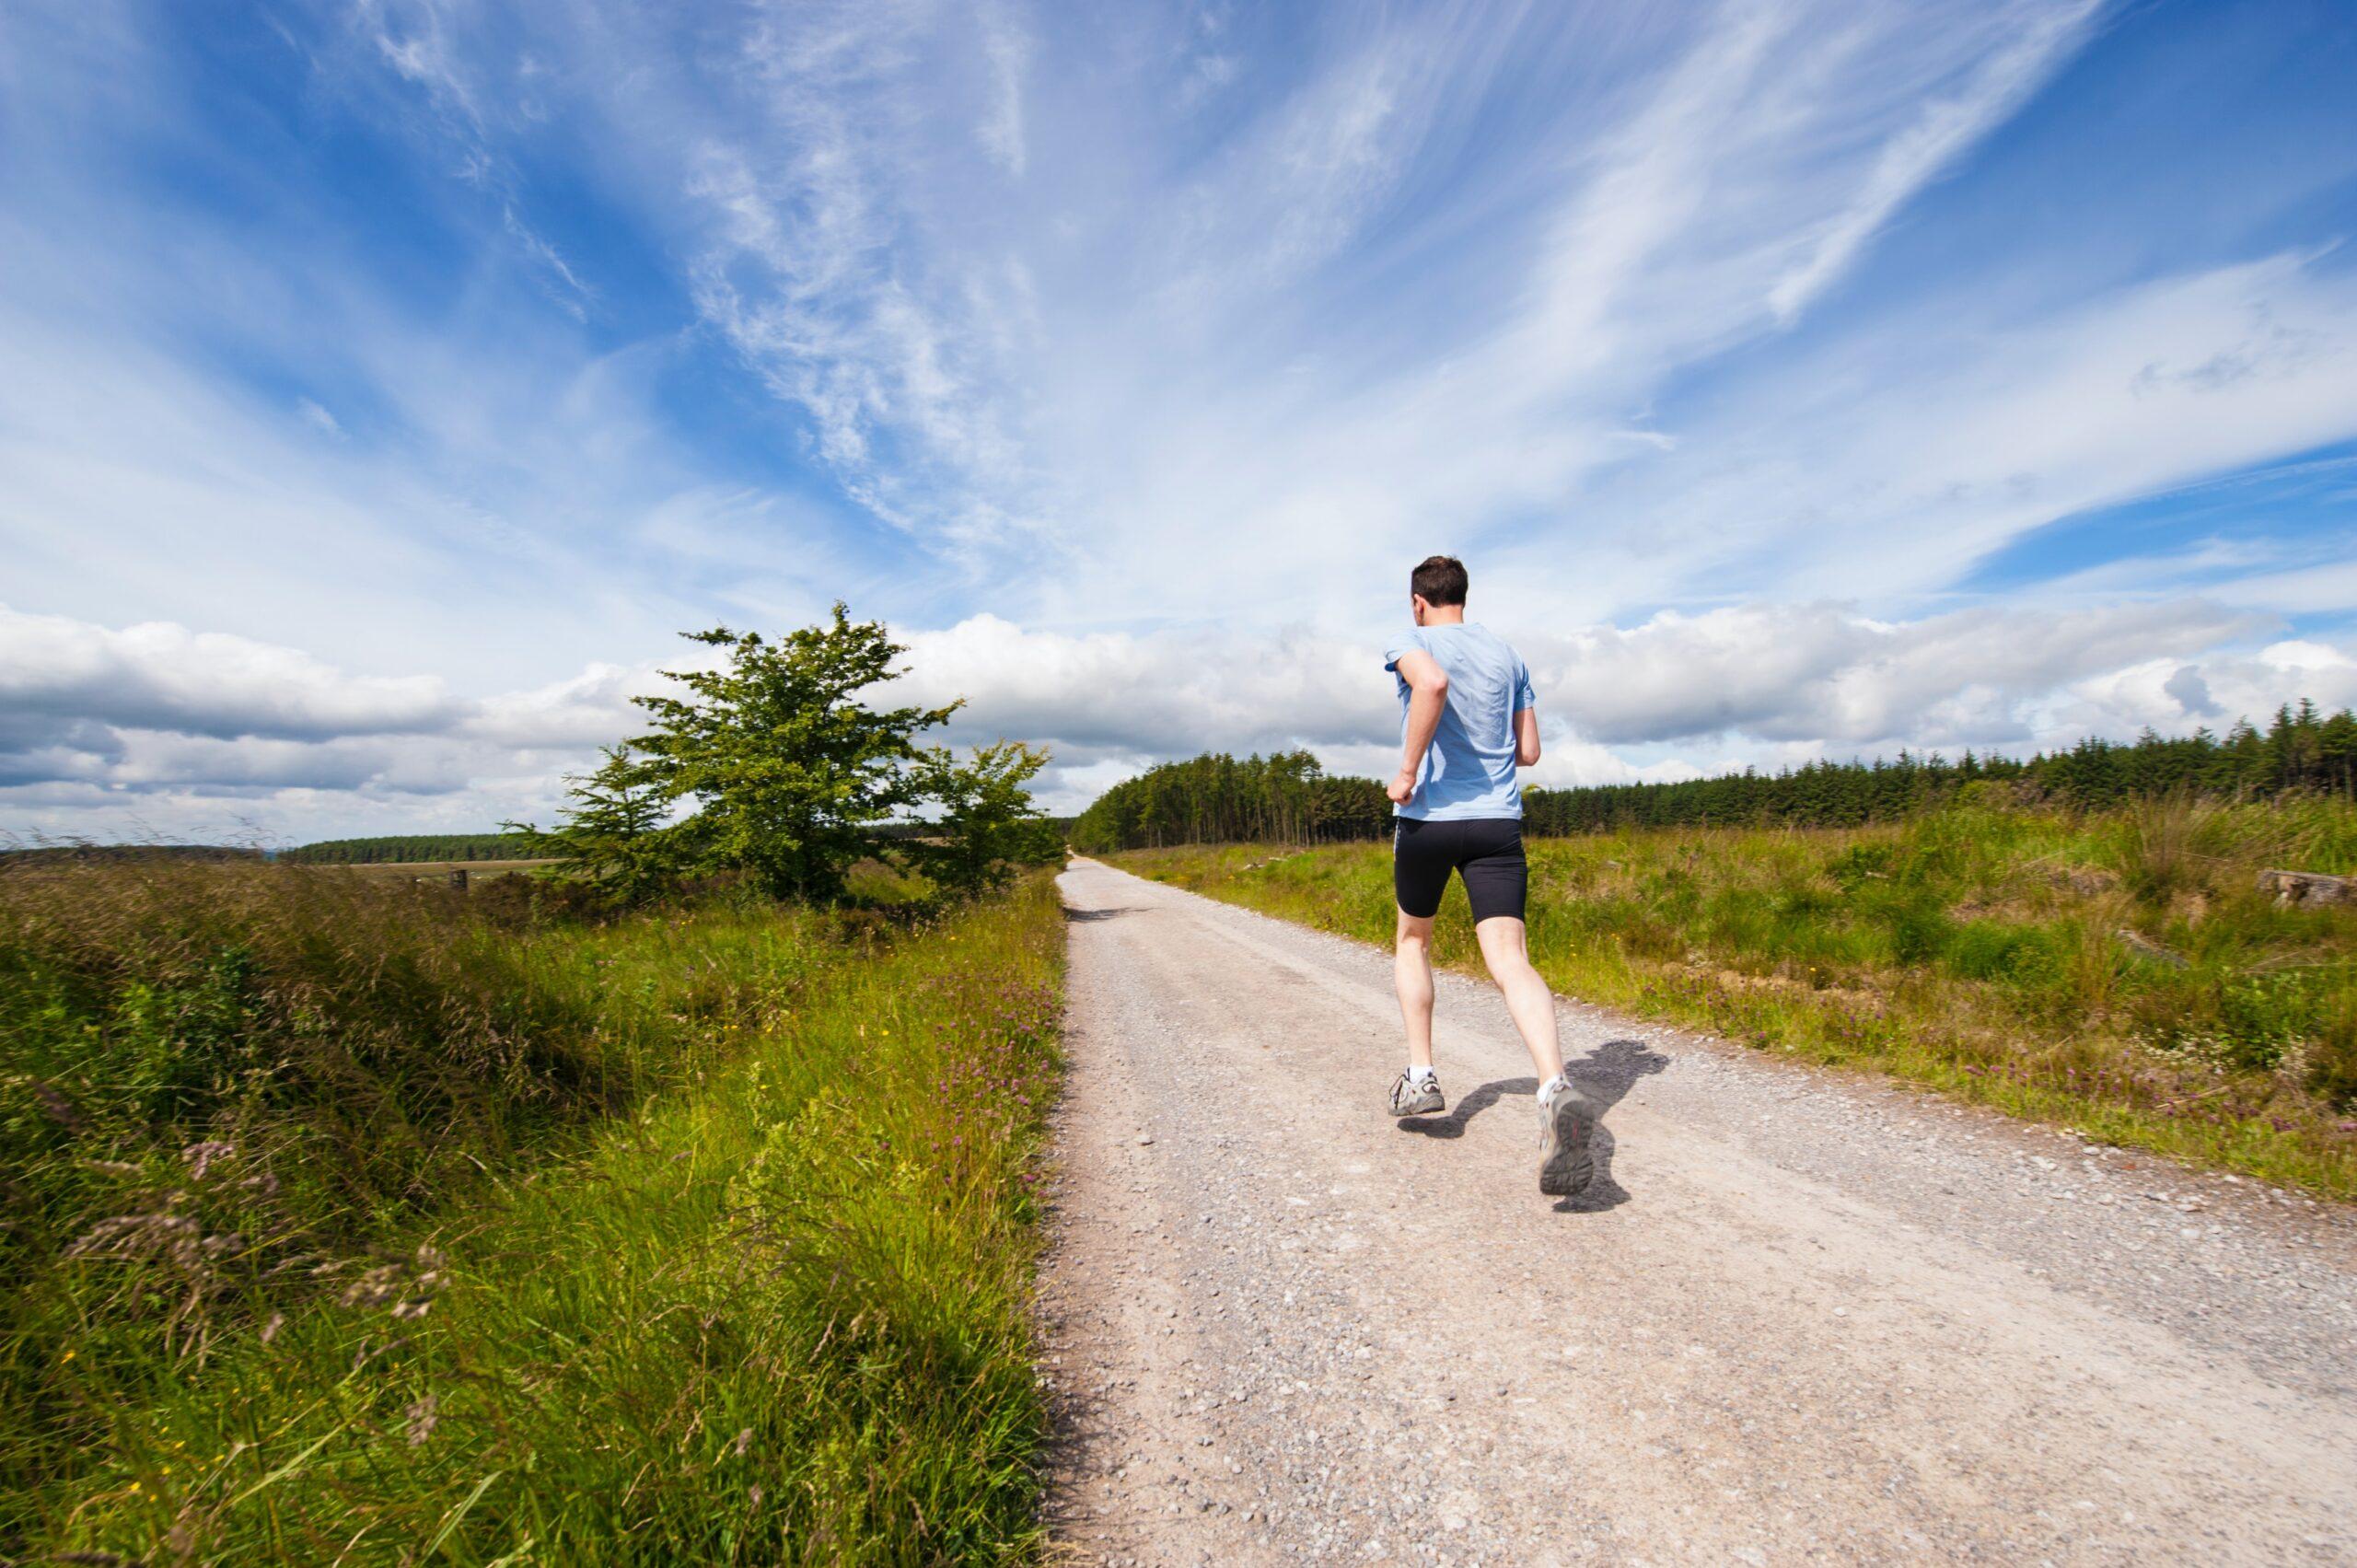 6 Manfaat Olahraga Lari Pagi Bagi Kesehatan Tubuh